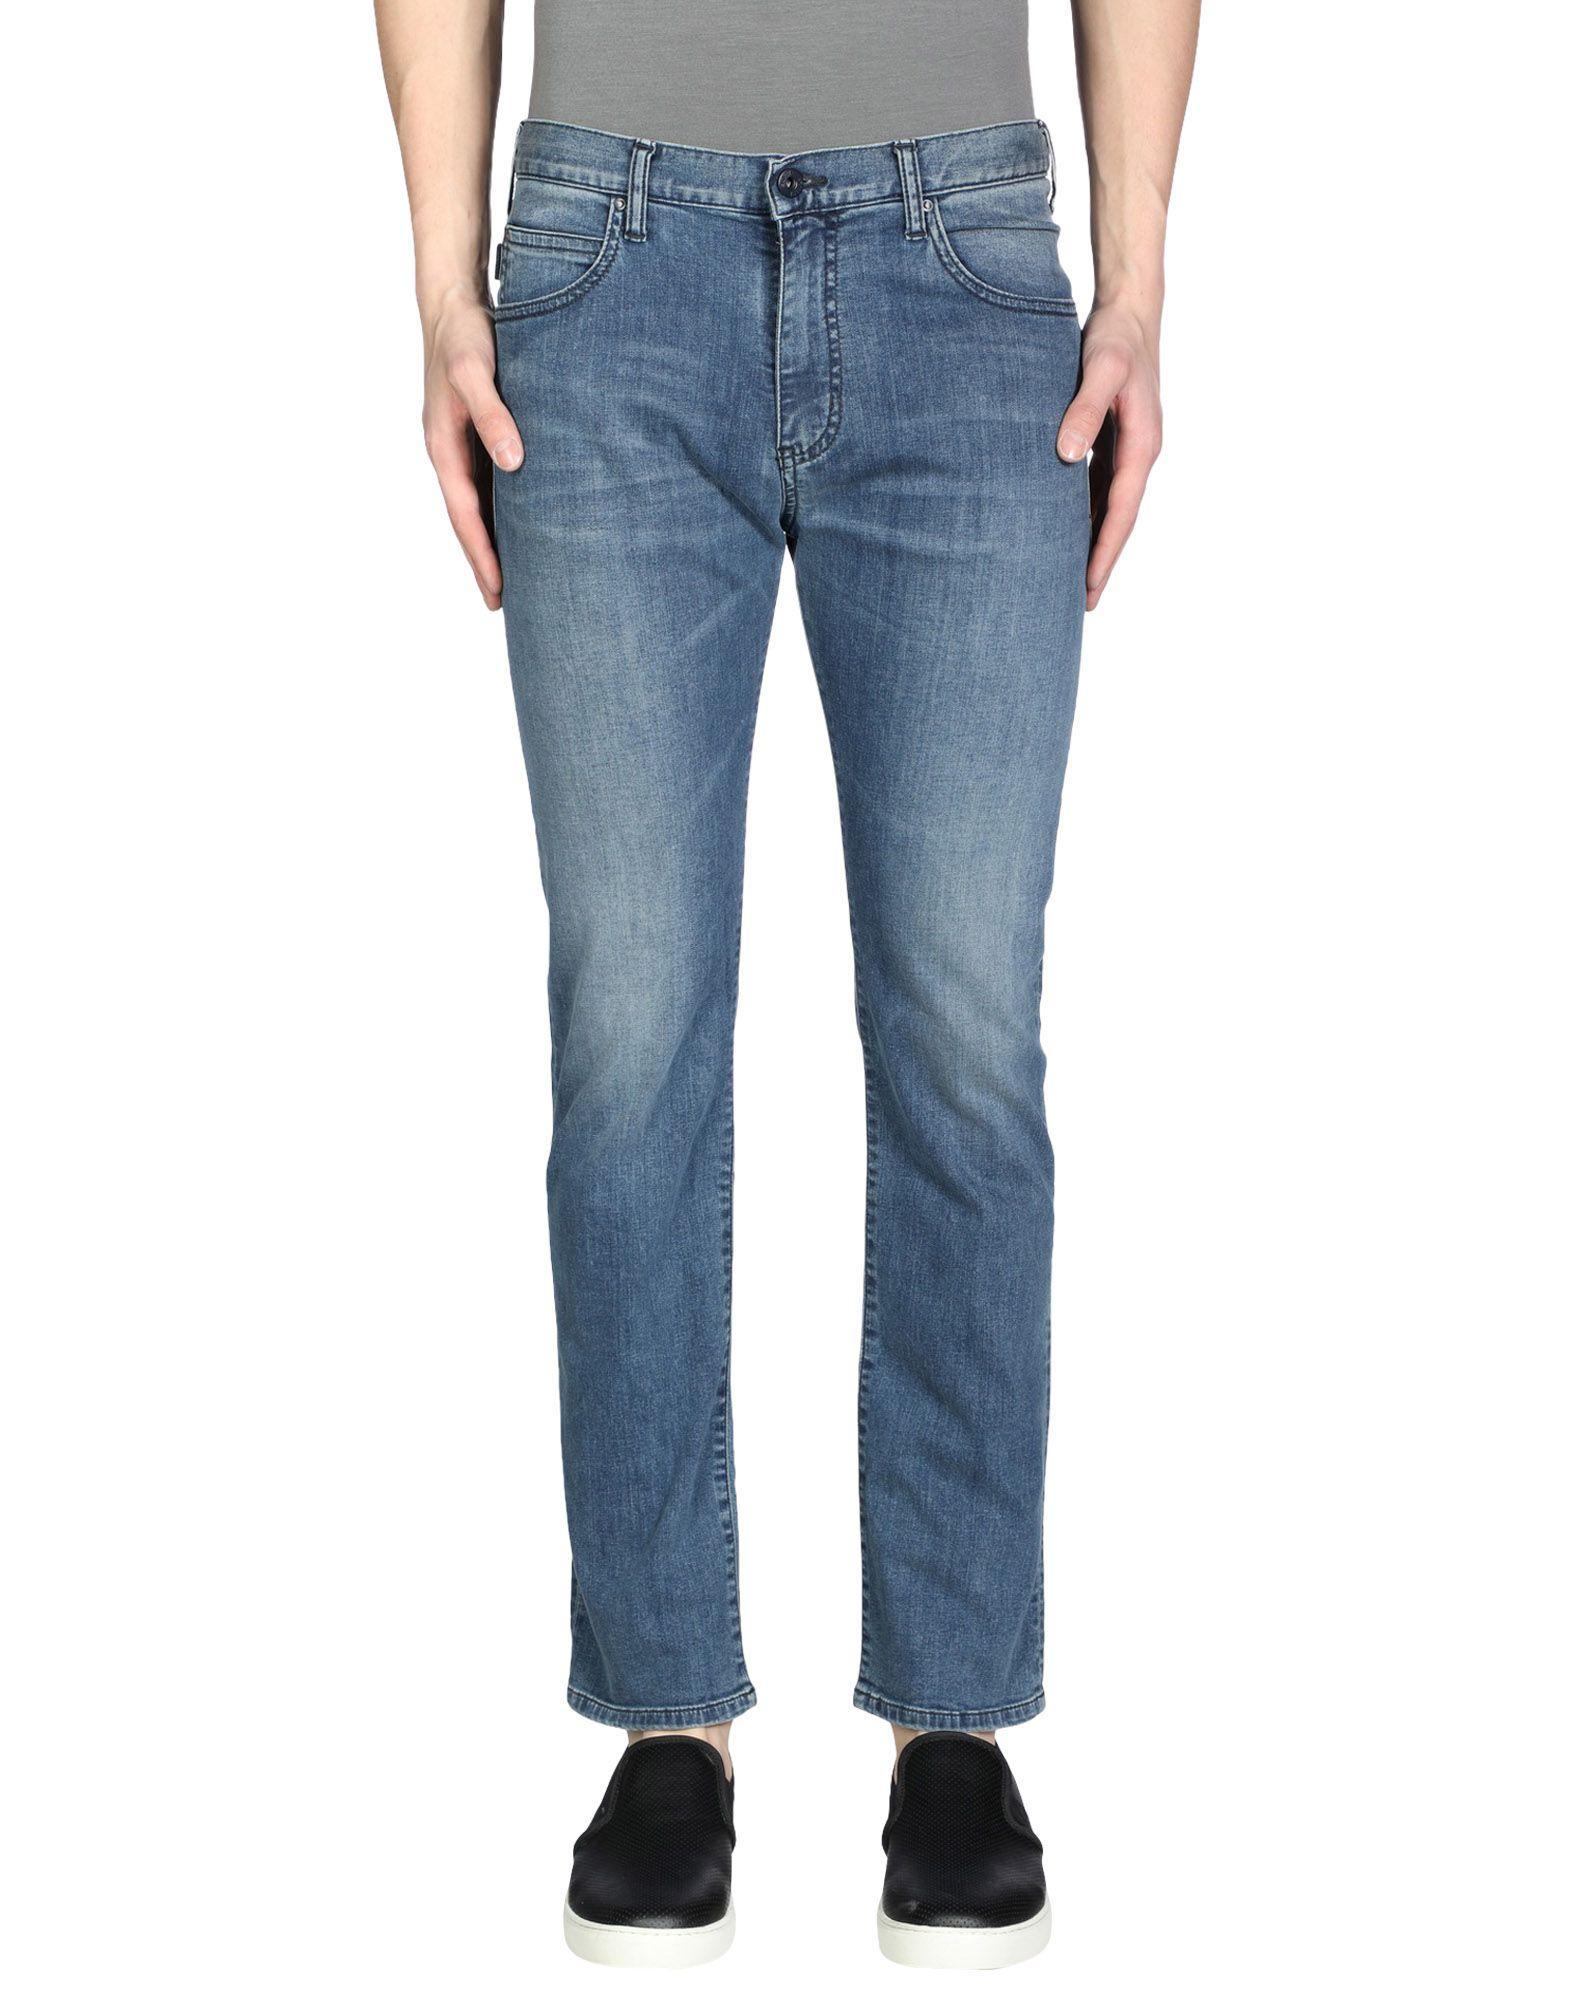 Armani Jeans Jeans In Blue